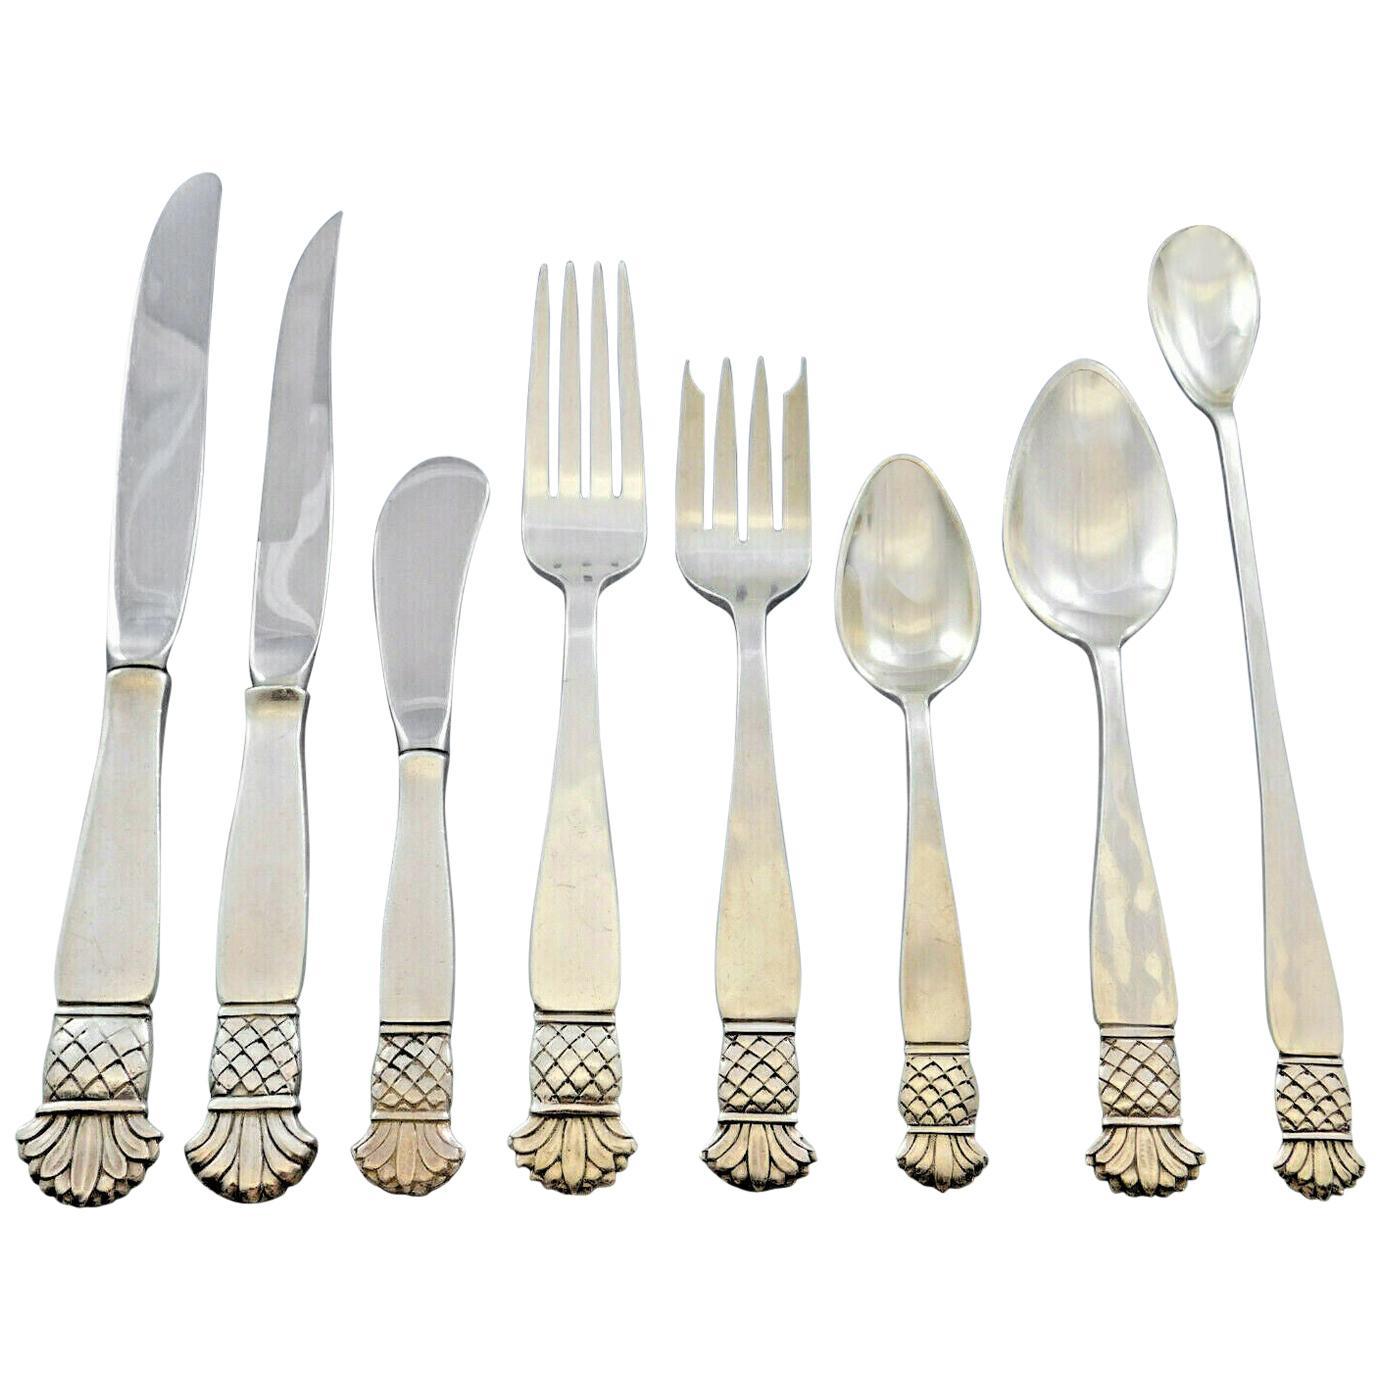 Grenada Old Newbury Crafters Sterling Silver Flatware Set Service 67 Pcs Dinner